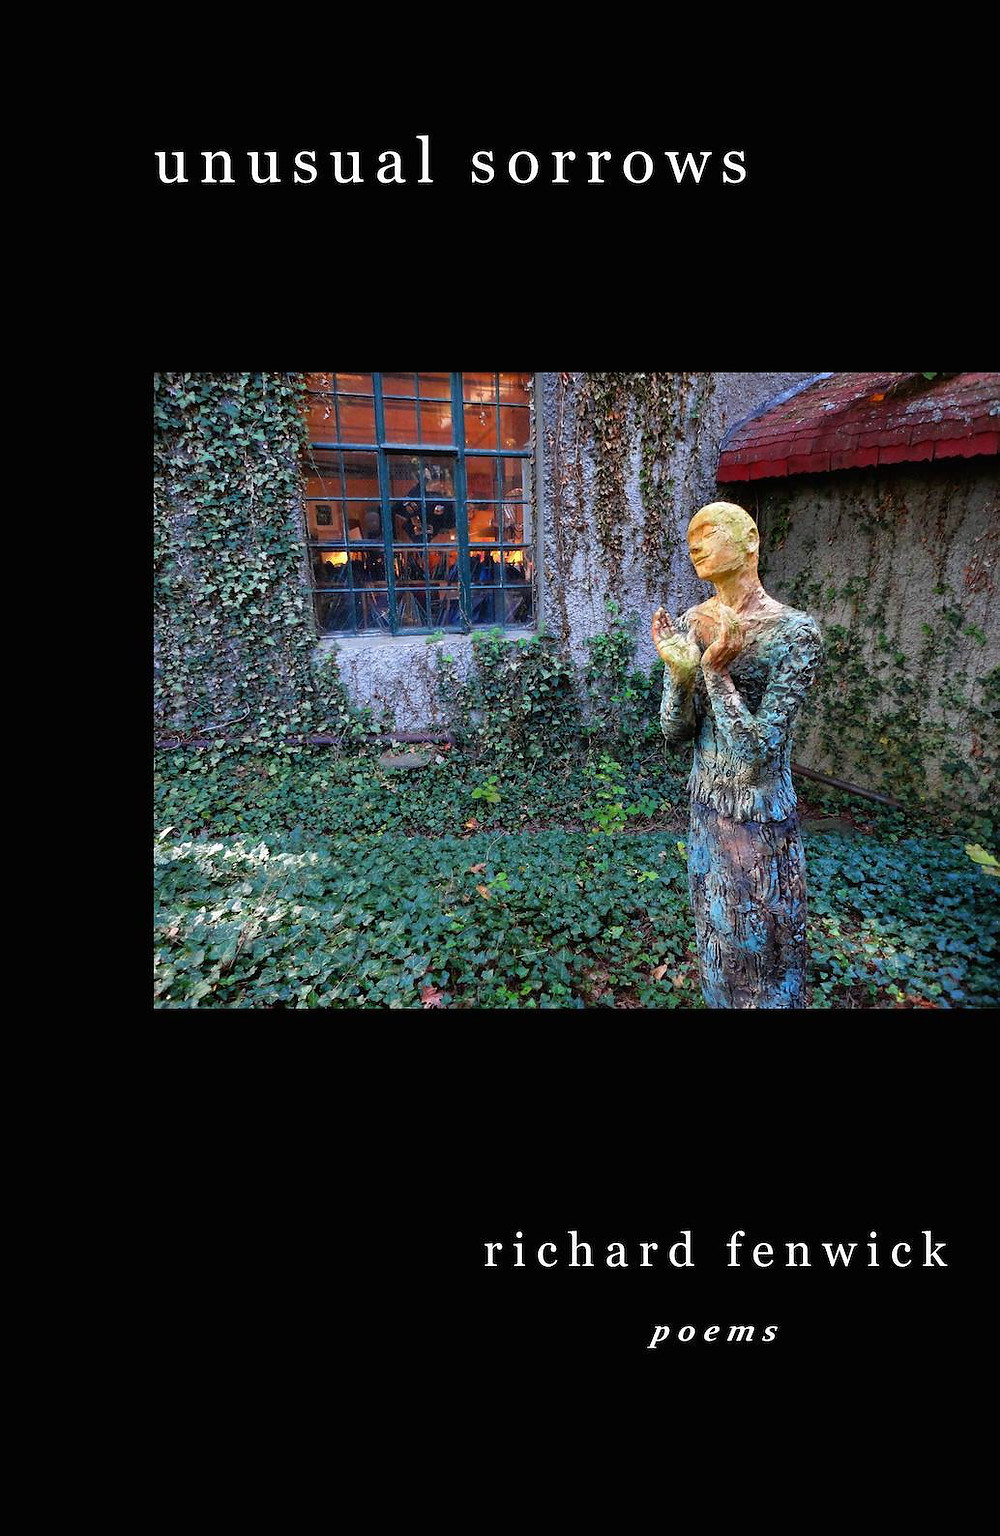 Richard Fenwick new book cover.jpg